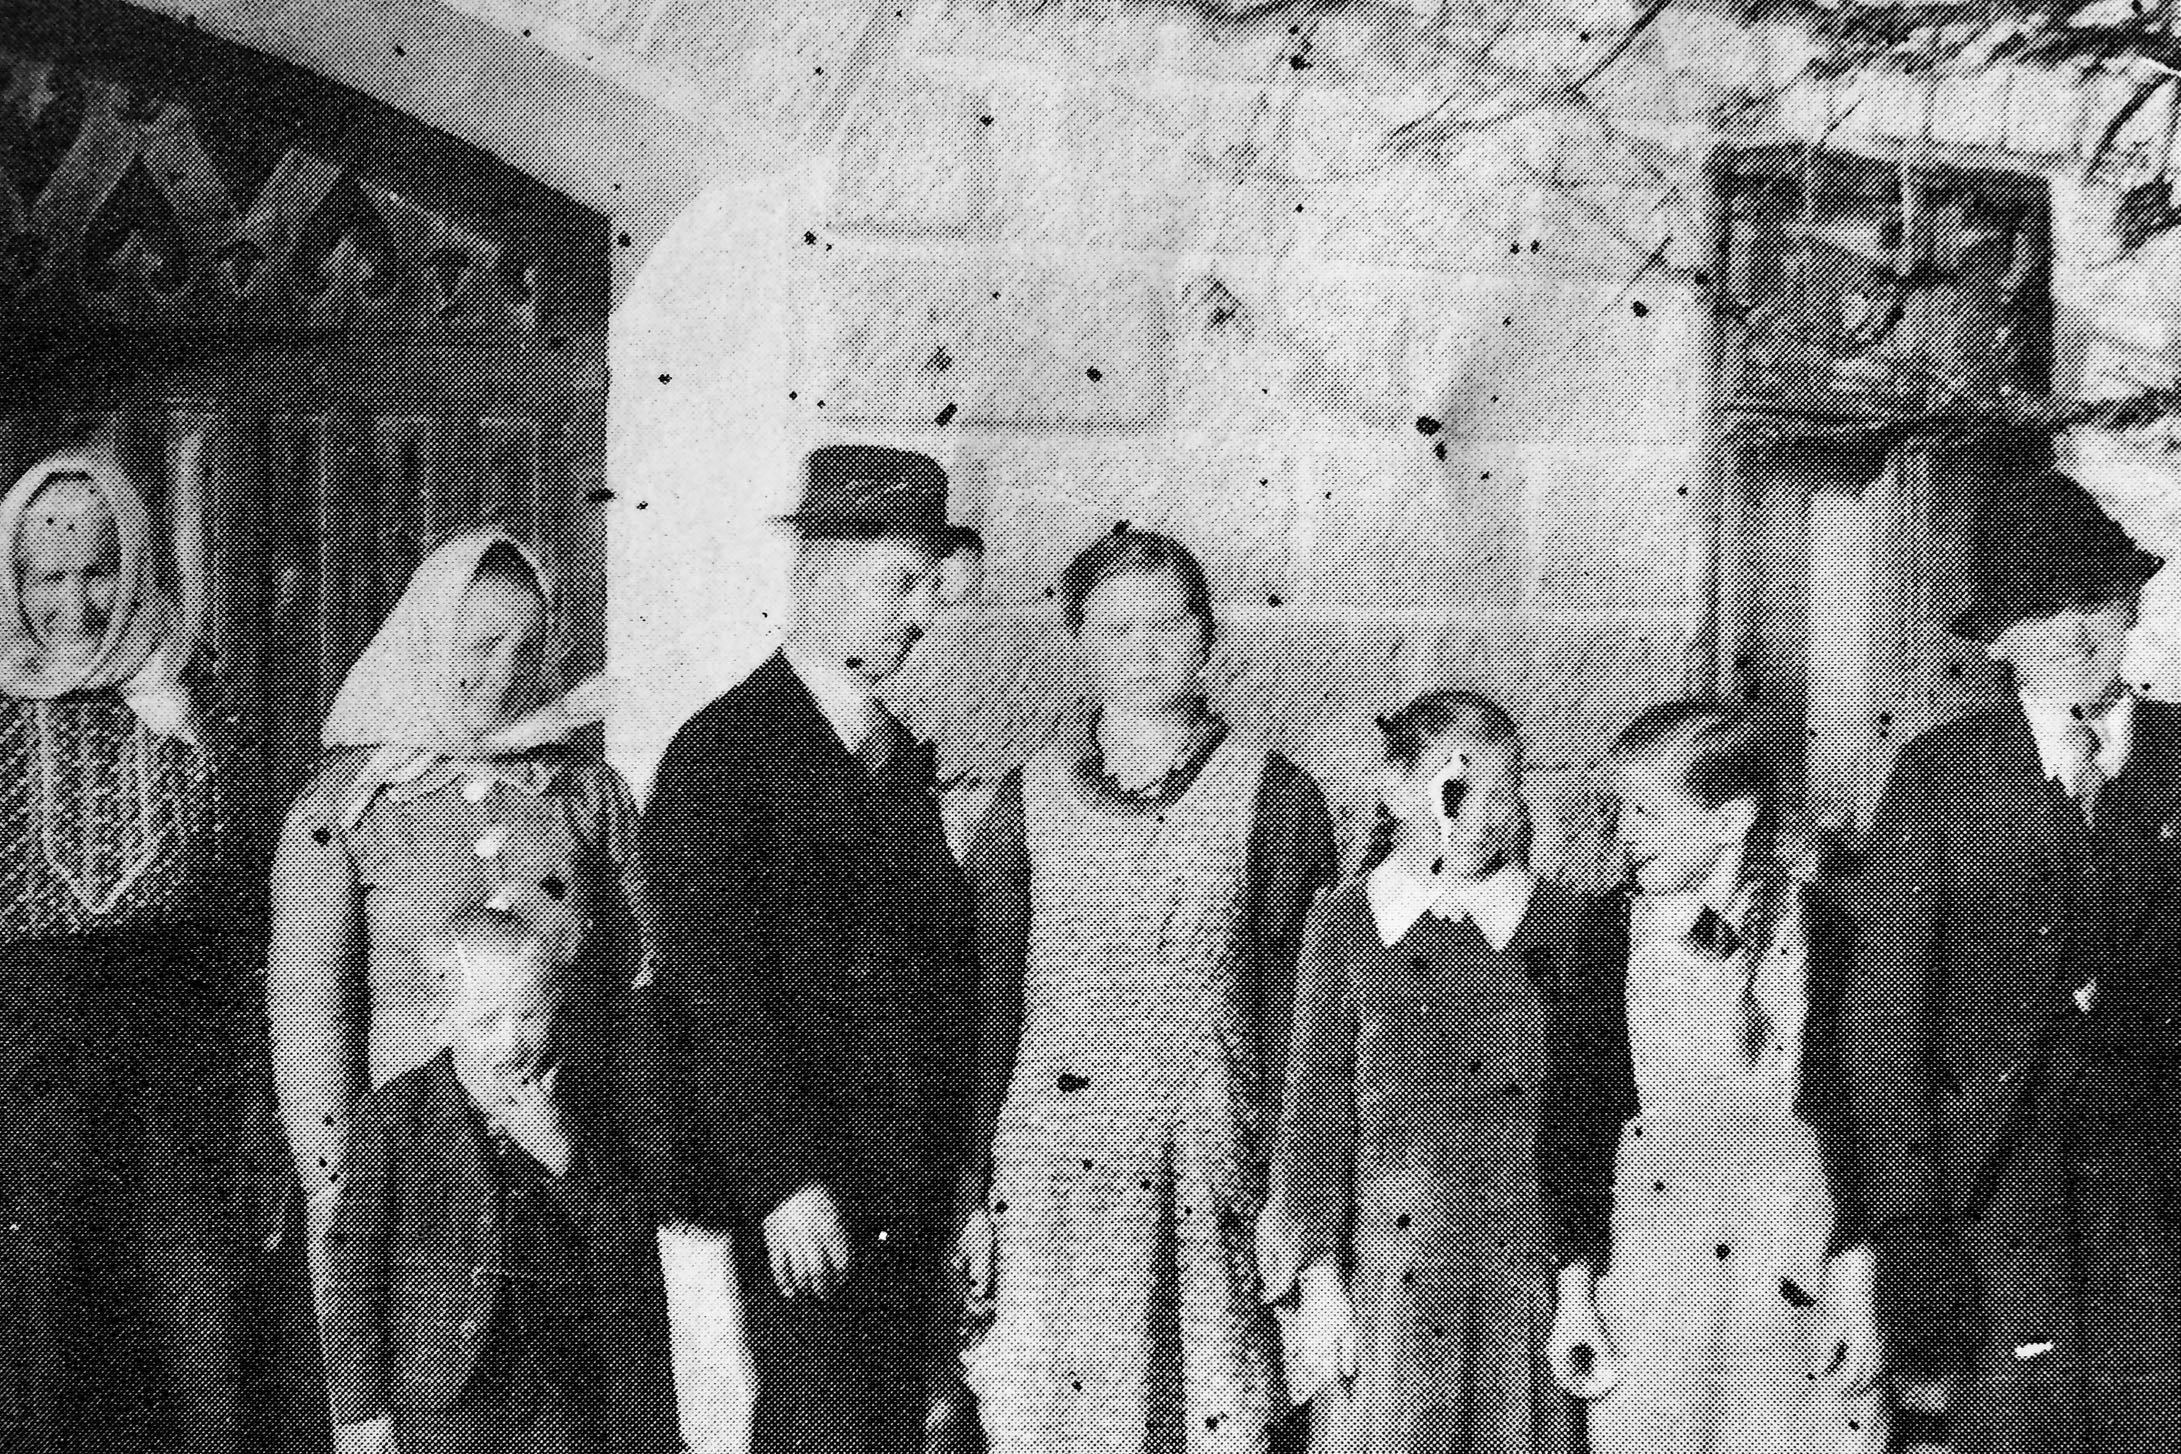 Familie Marko 1942